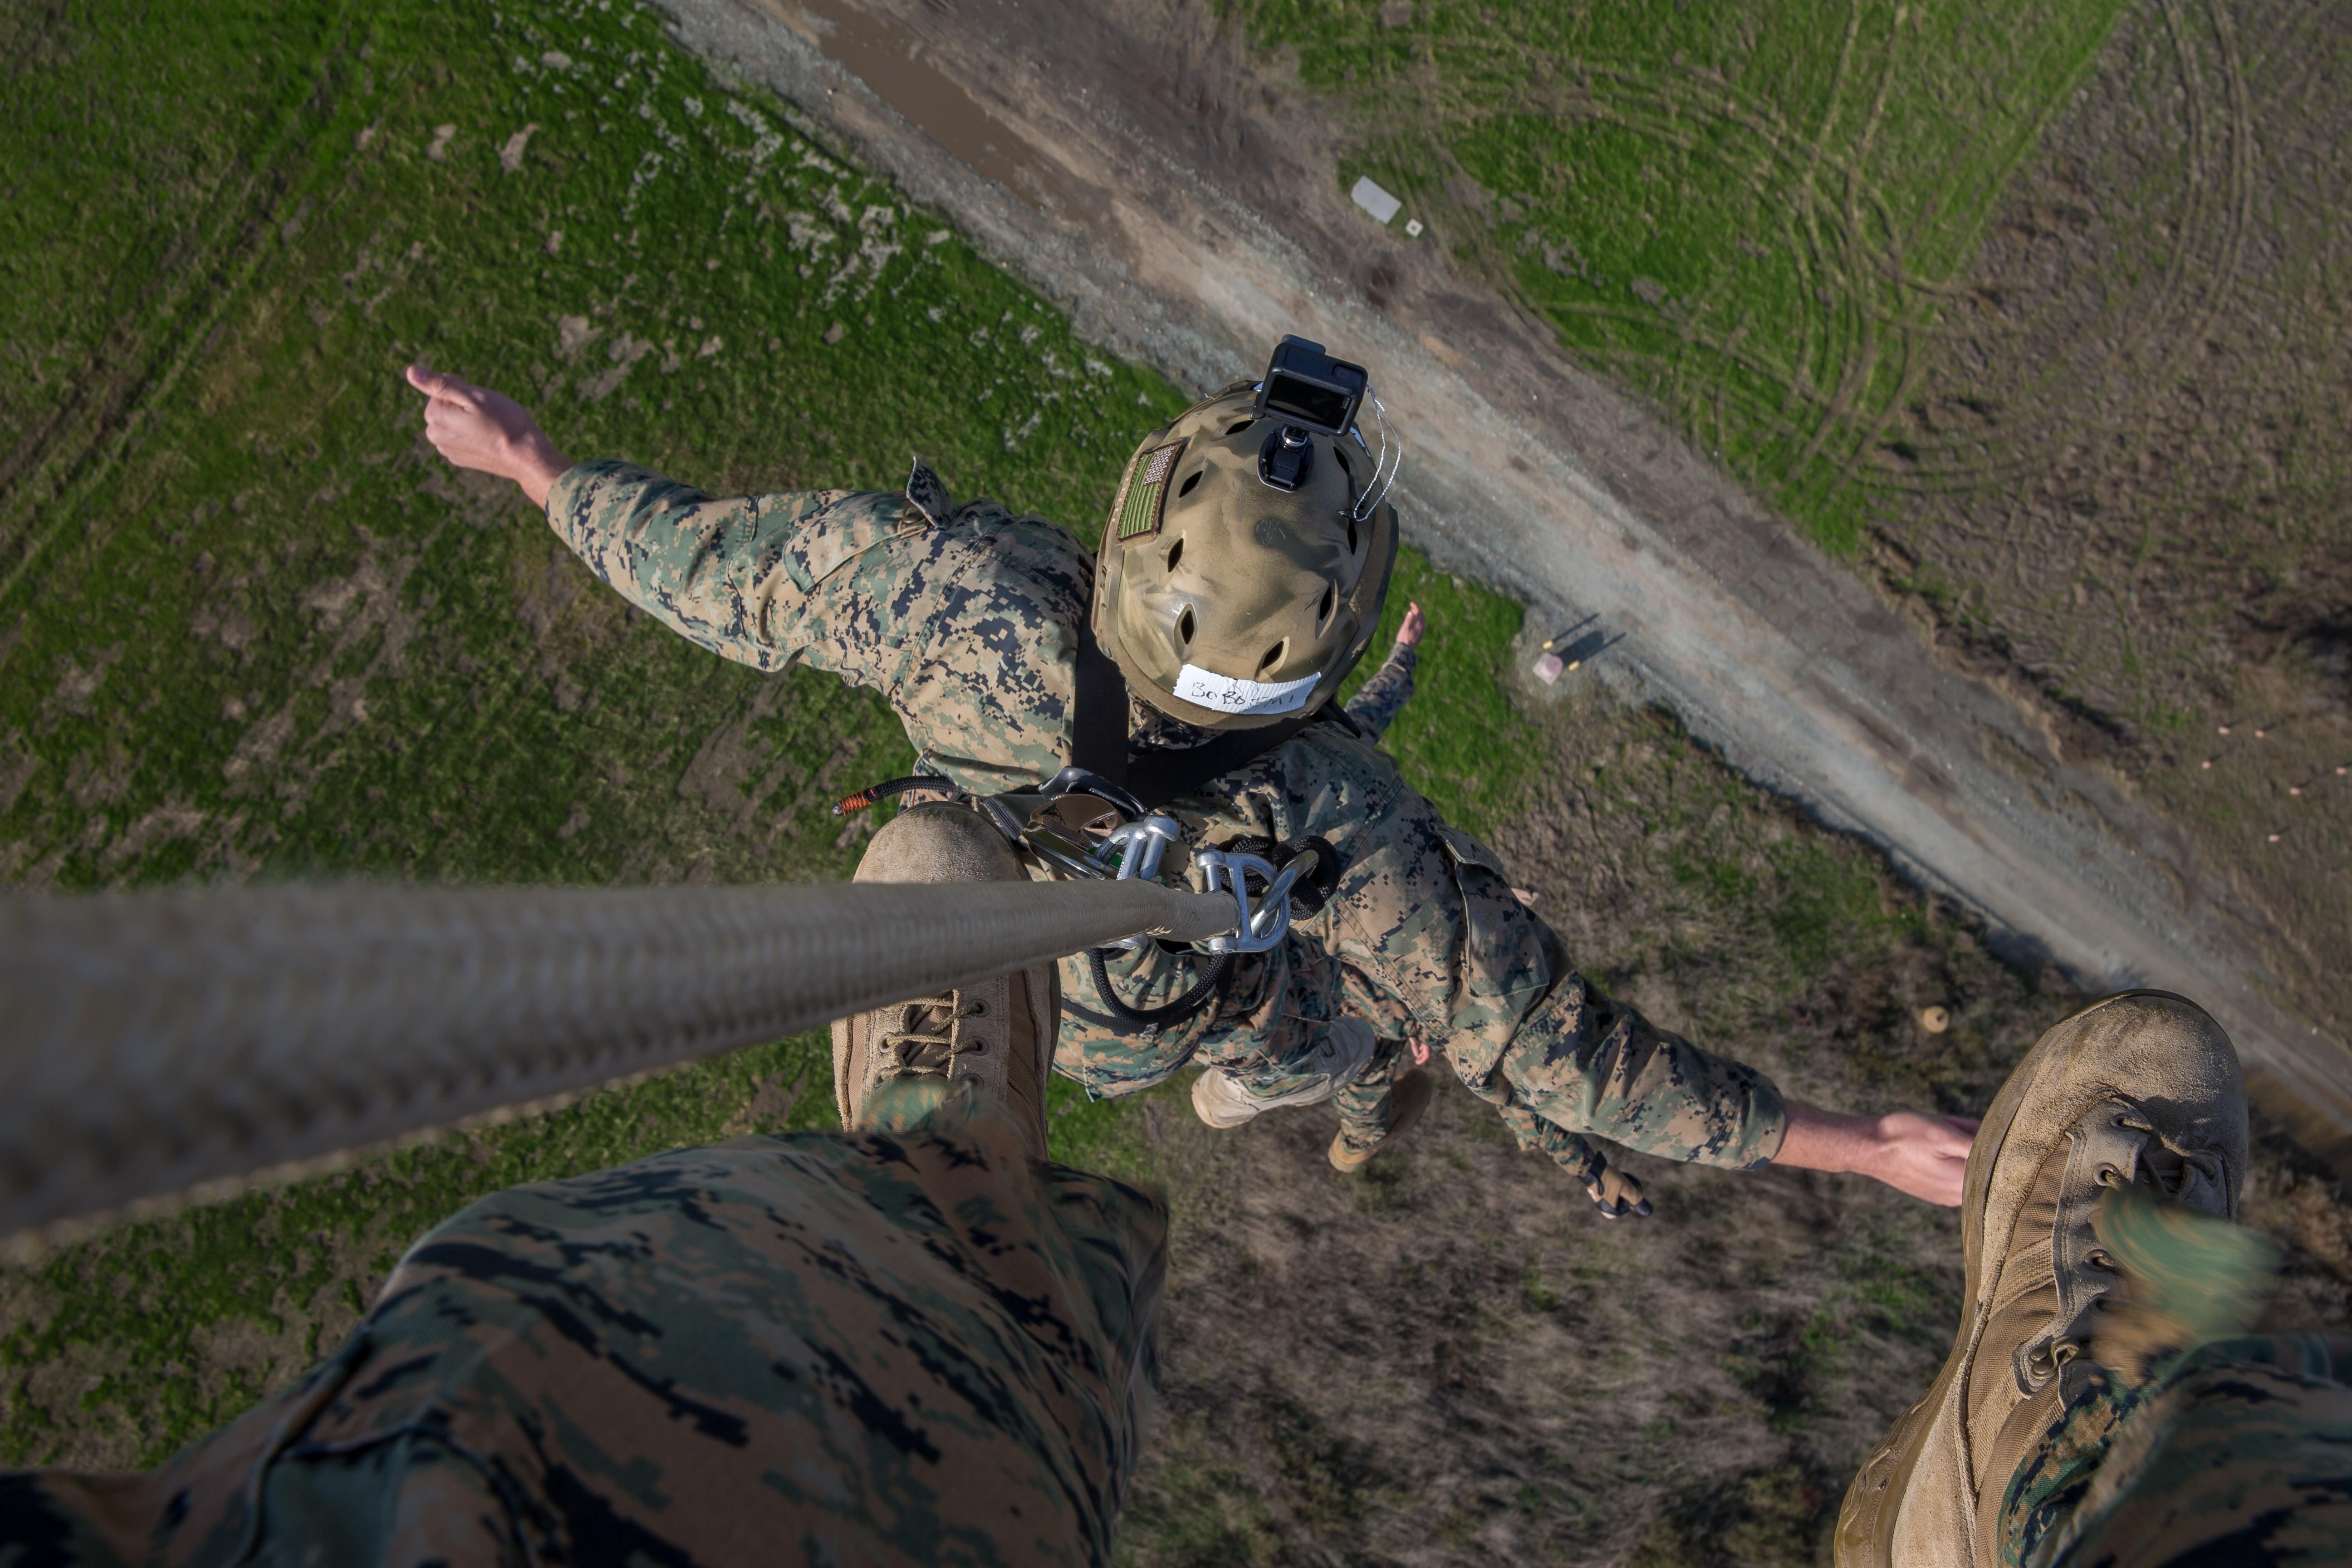 https://media.defense.gov/2020/Jan/15/2002235330/-1/-1/0/191211-M-JX780-1019.JPG